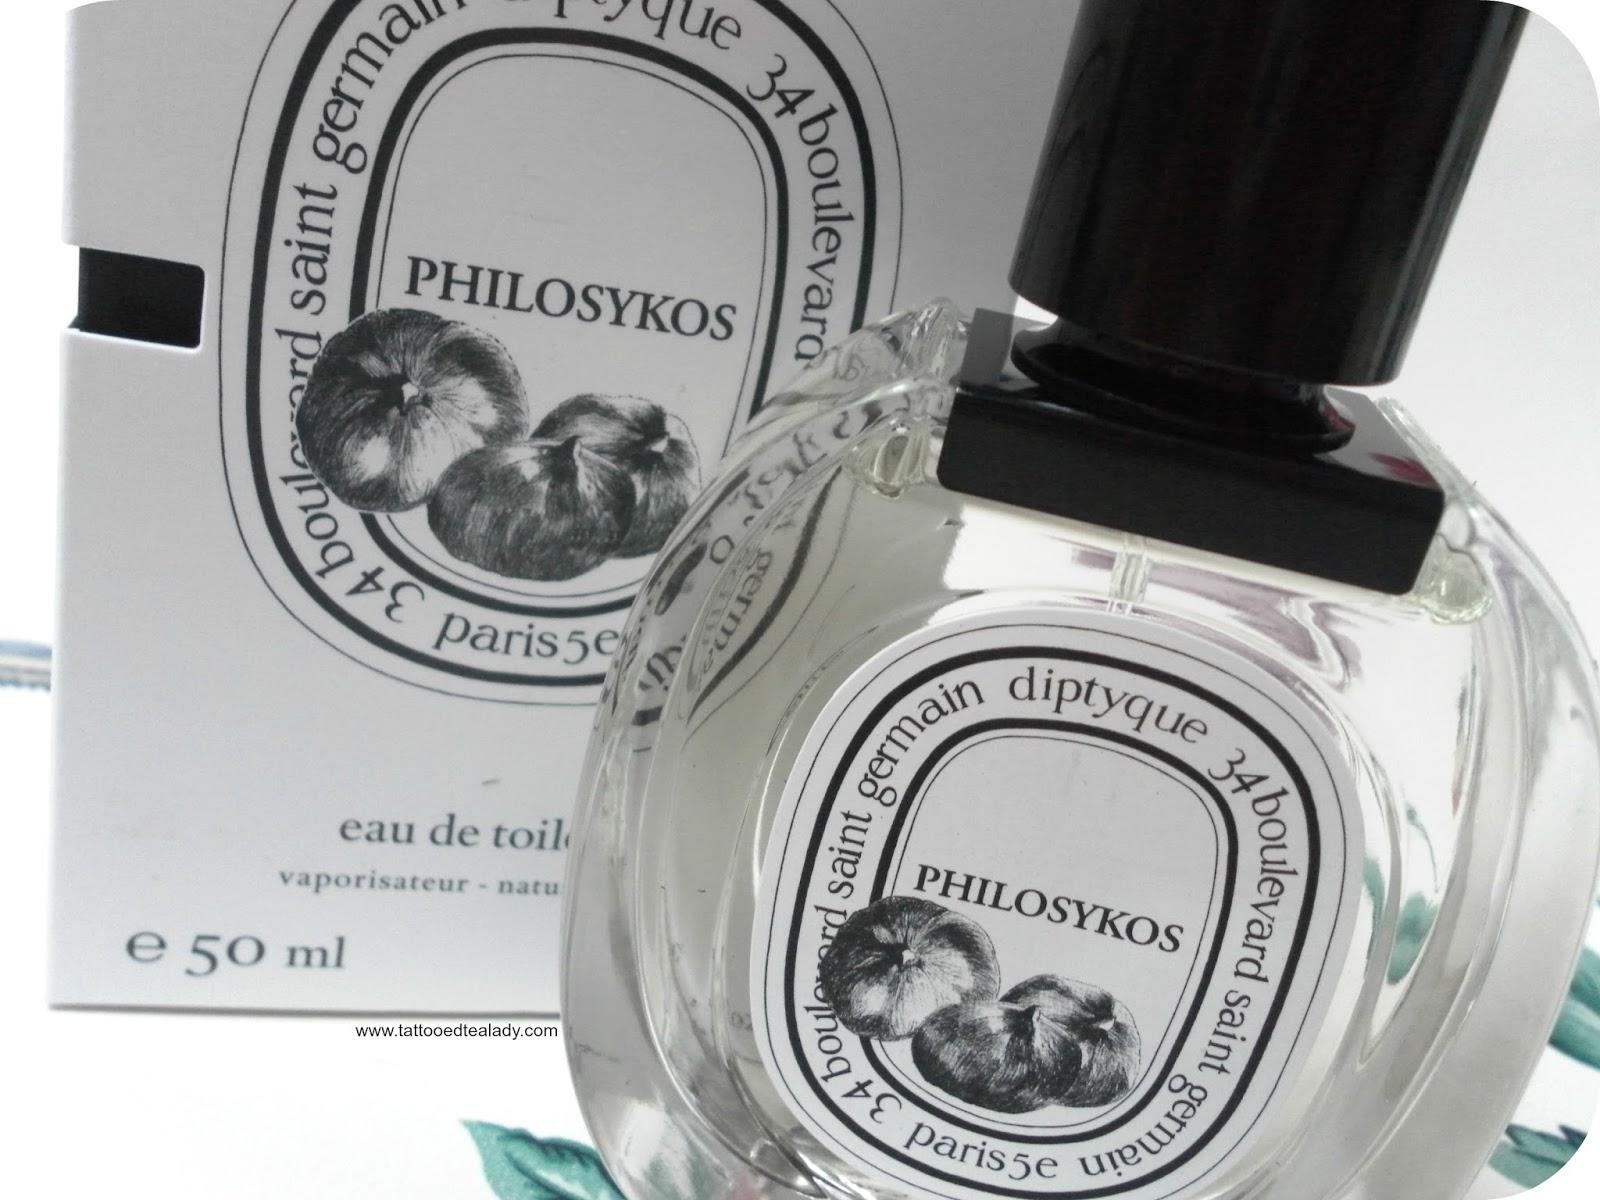 Diptyque Philosykos, worth the hype   Tattooed Tealady